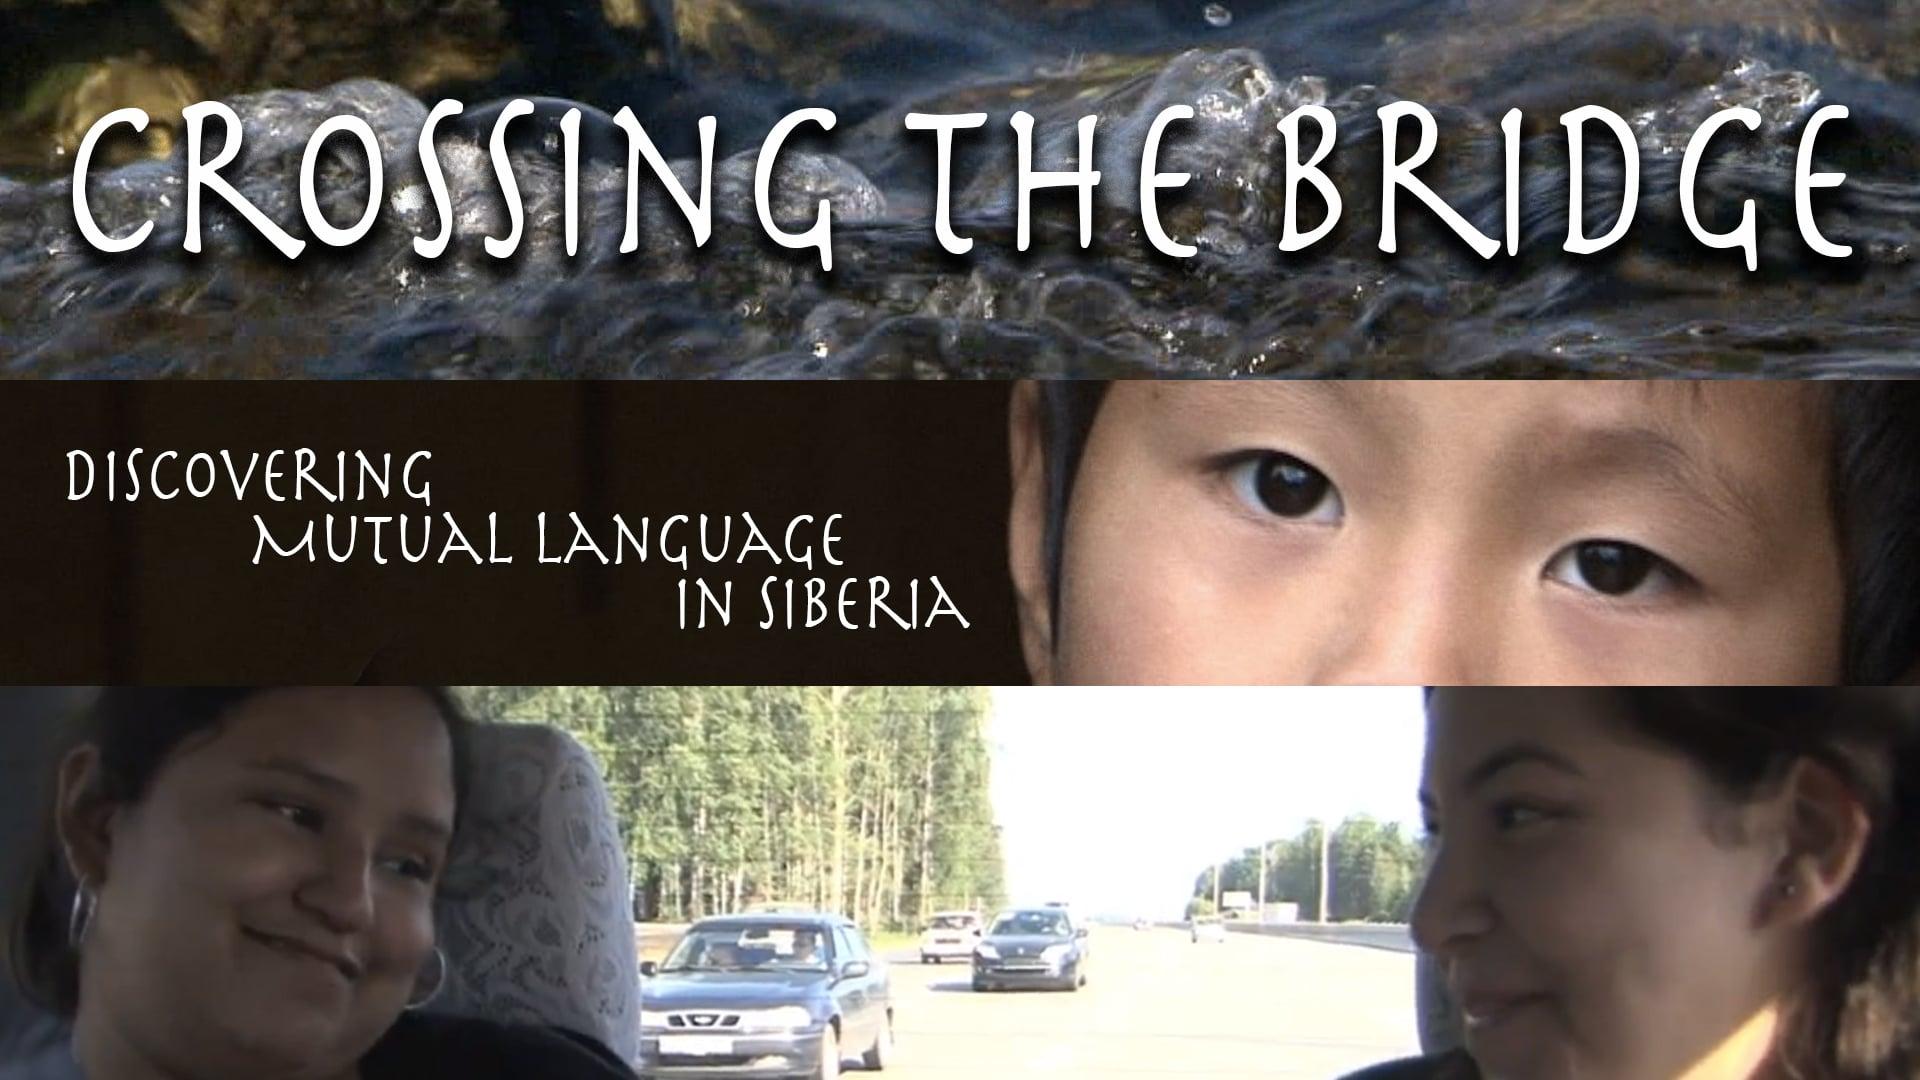 Crossing the Bridge - Discovering Mutual Language in Siberia